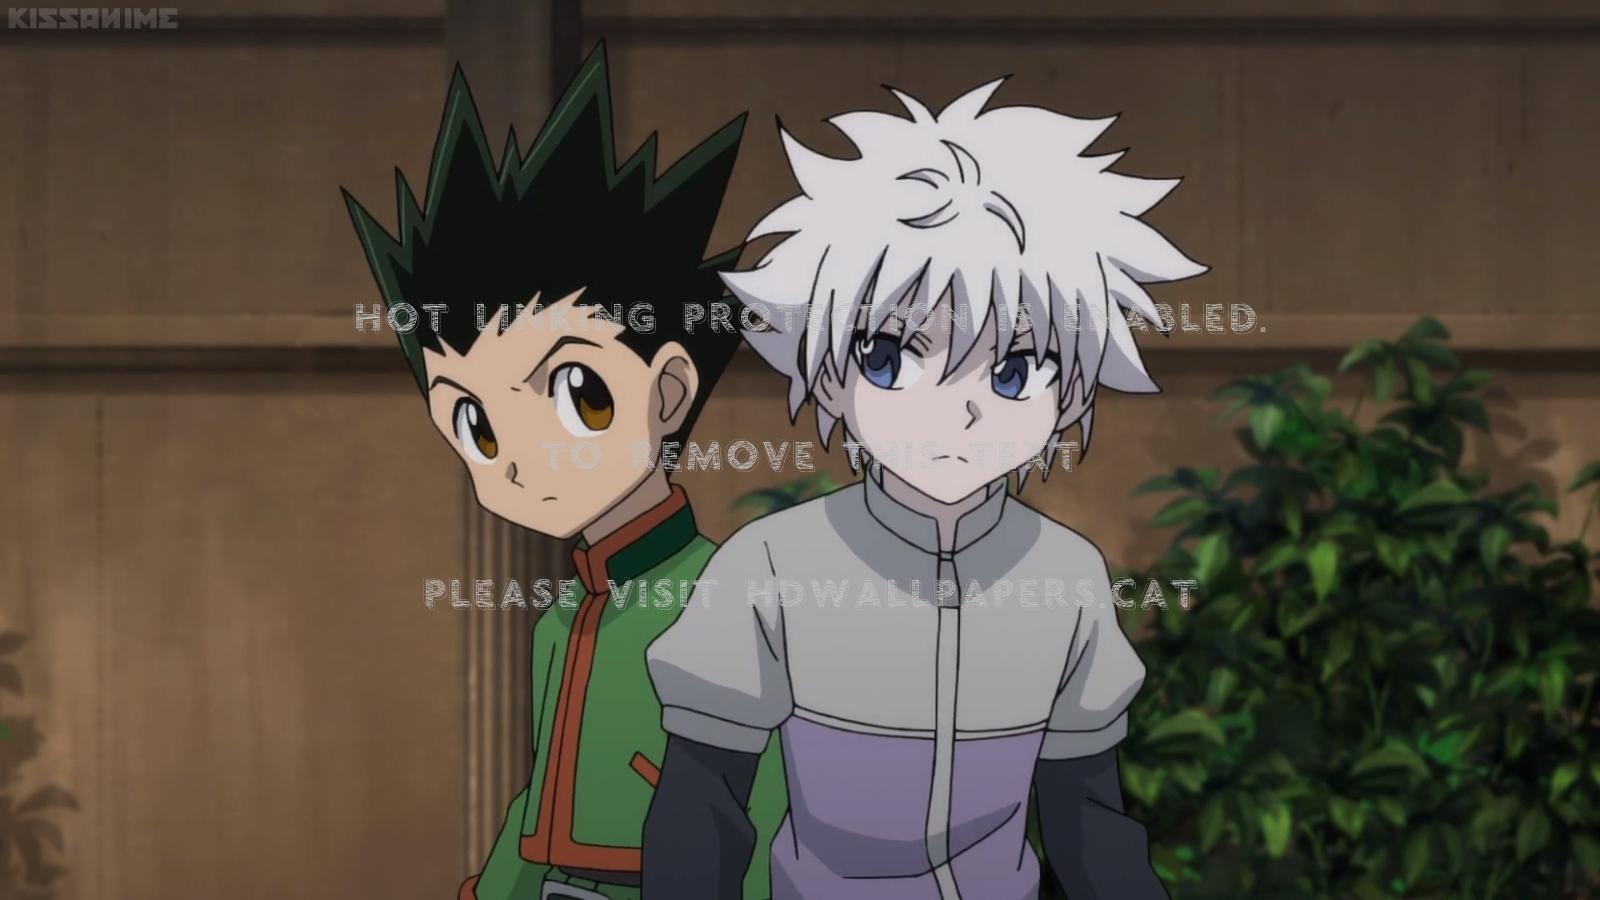 Gon Killua Green Hair Spiky Hxh Anime Boy Anime Boy Anime Green Hair 2534286 Hd Wallpaper Backgrounds Download